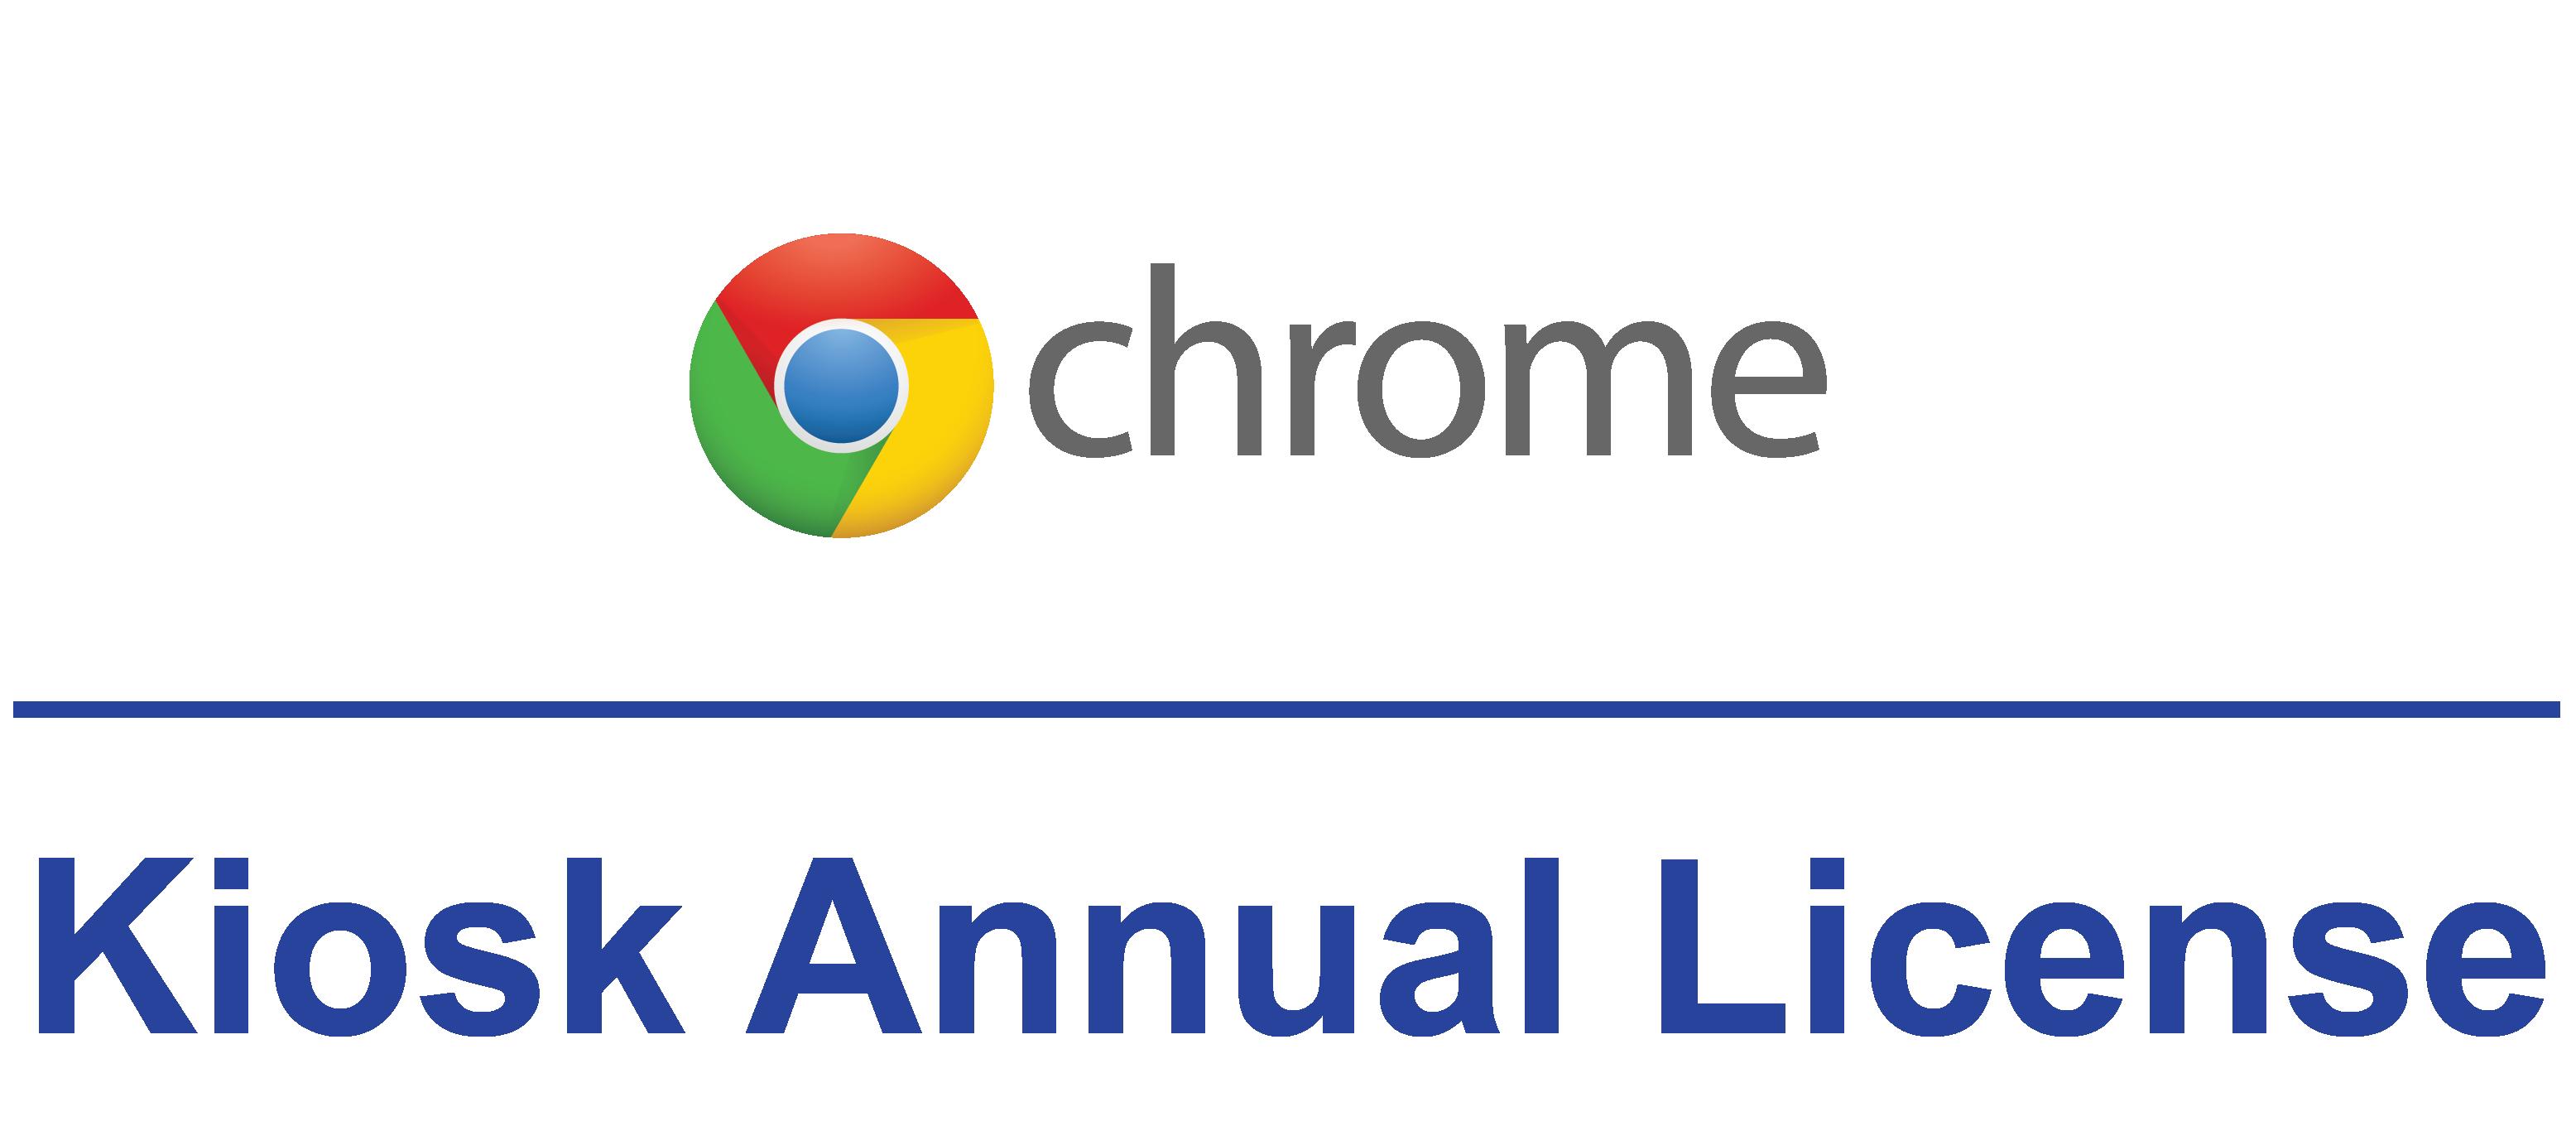 Chrome Device Management -Annual Kiosk License